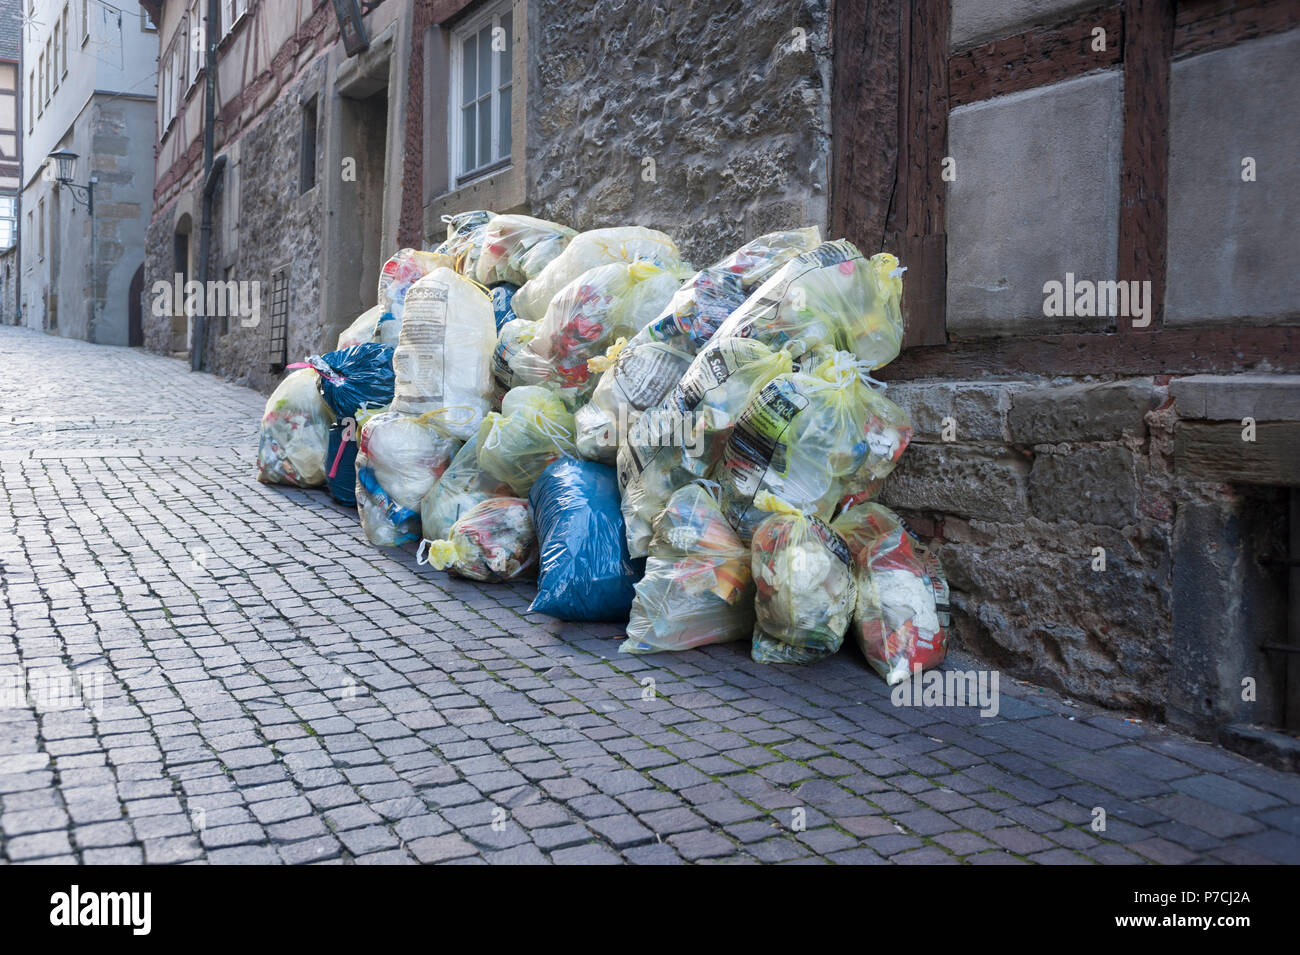 rubbish bag, schwaebisch Hall, Hohenlohe region, Baden-Wuerttemberg, Heilbronn-Franconia, Germany - Stock Image